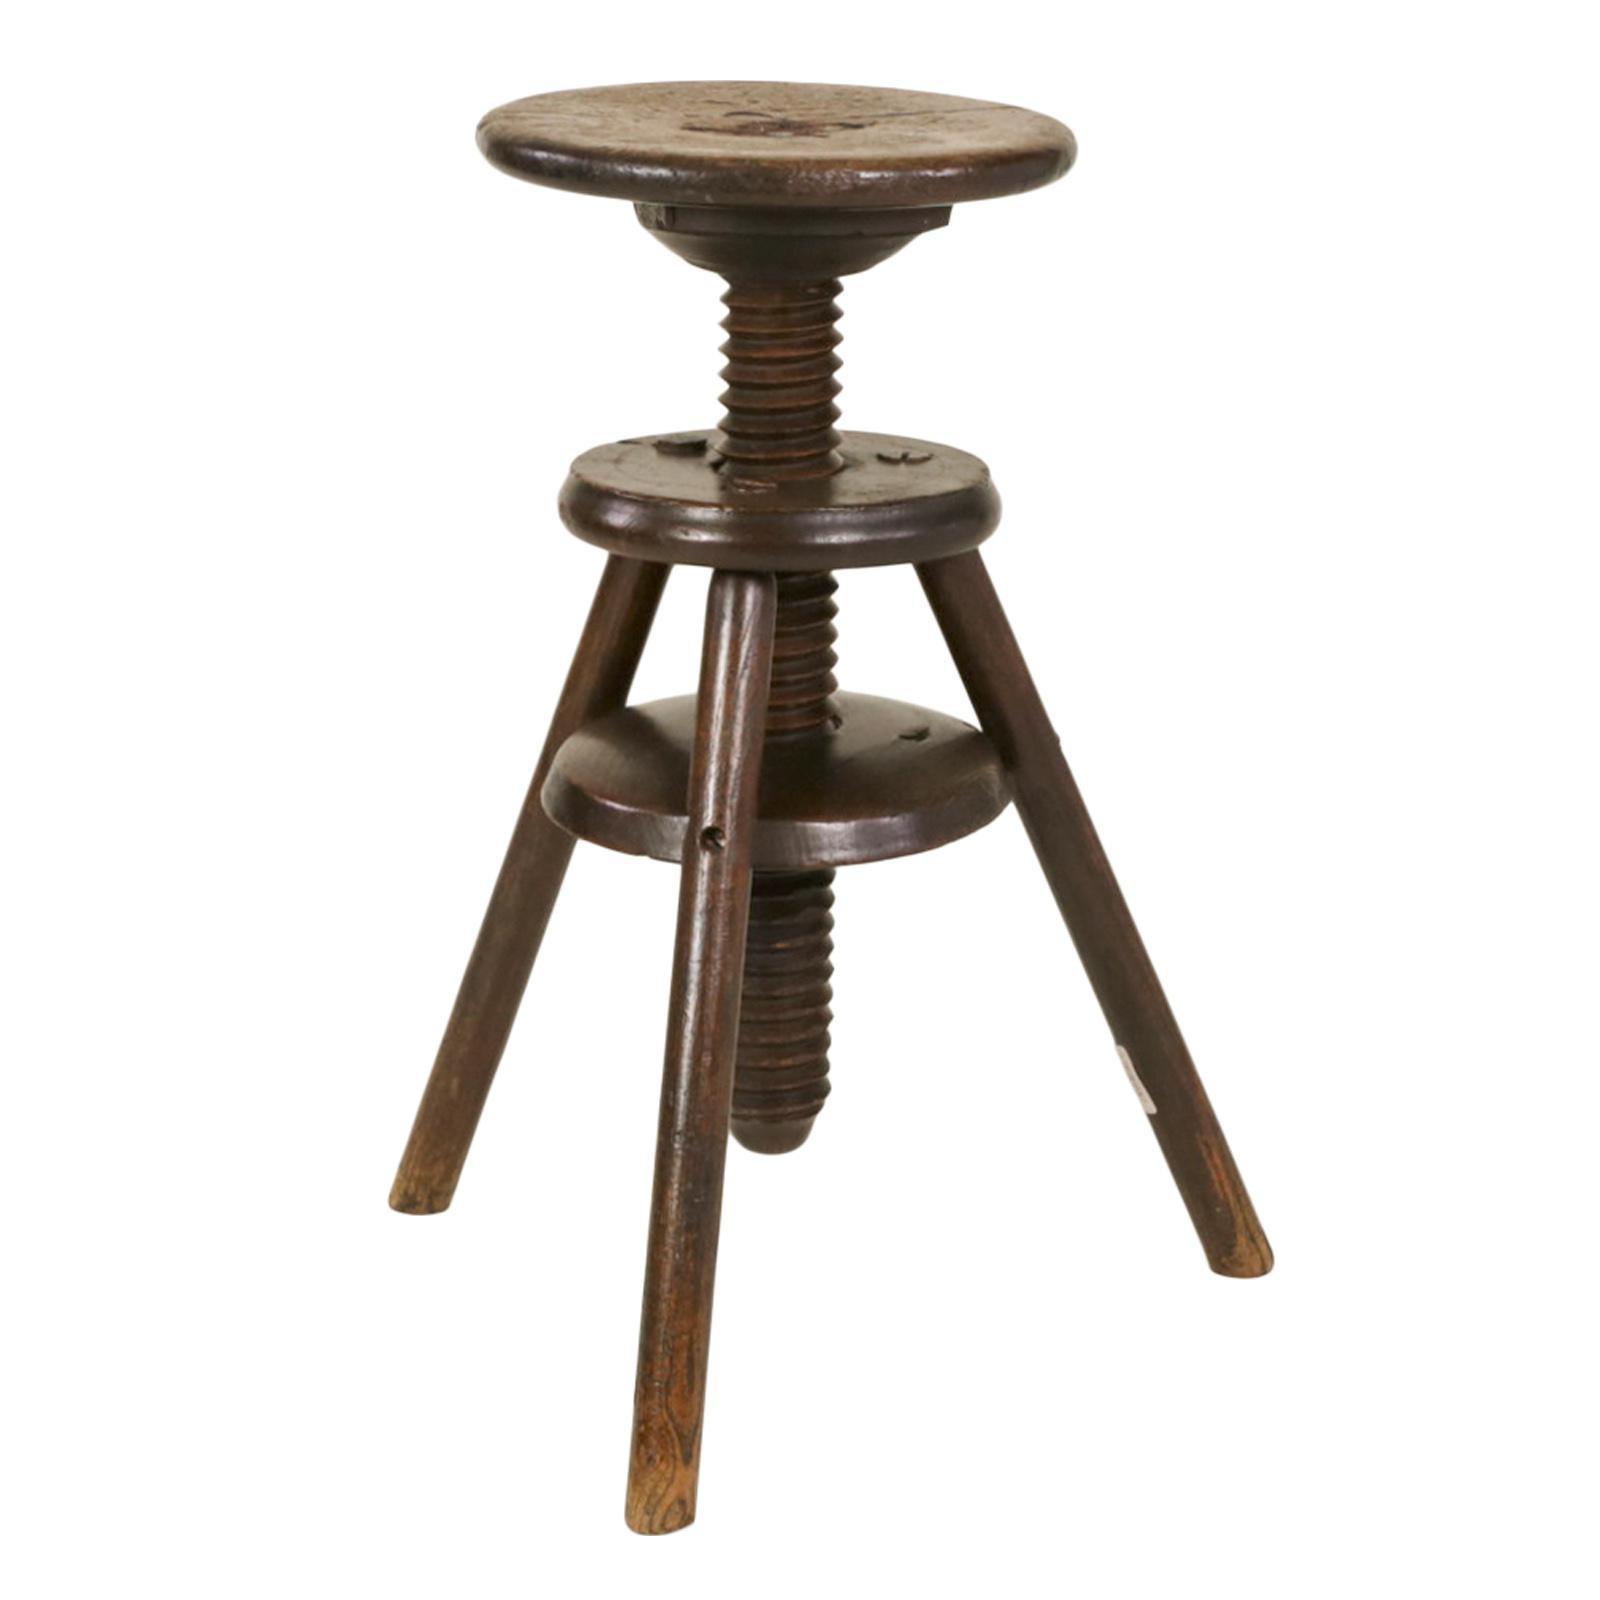 Cool 1870S English Oak Three Legged Adjustable Artist Stool Download Free Architecture Designs Embacsunscenecom